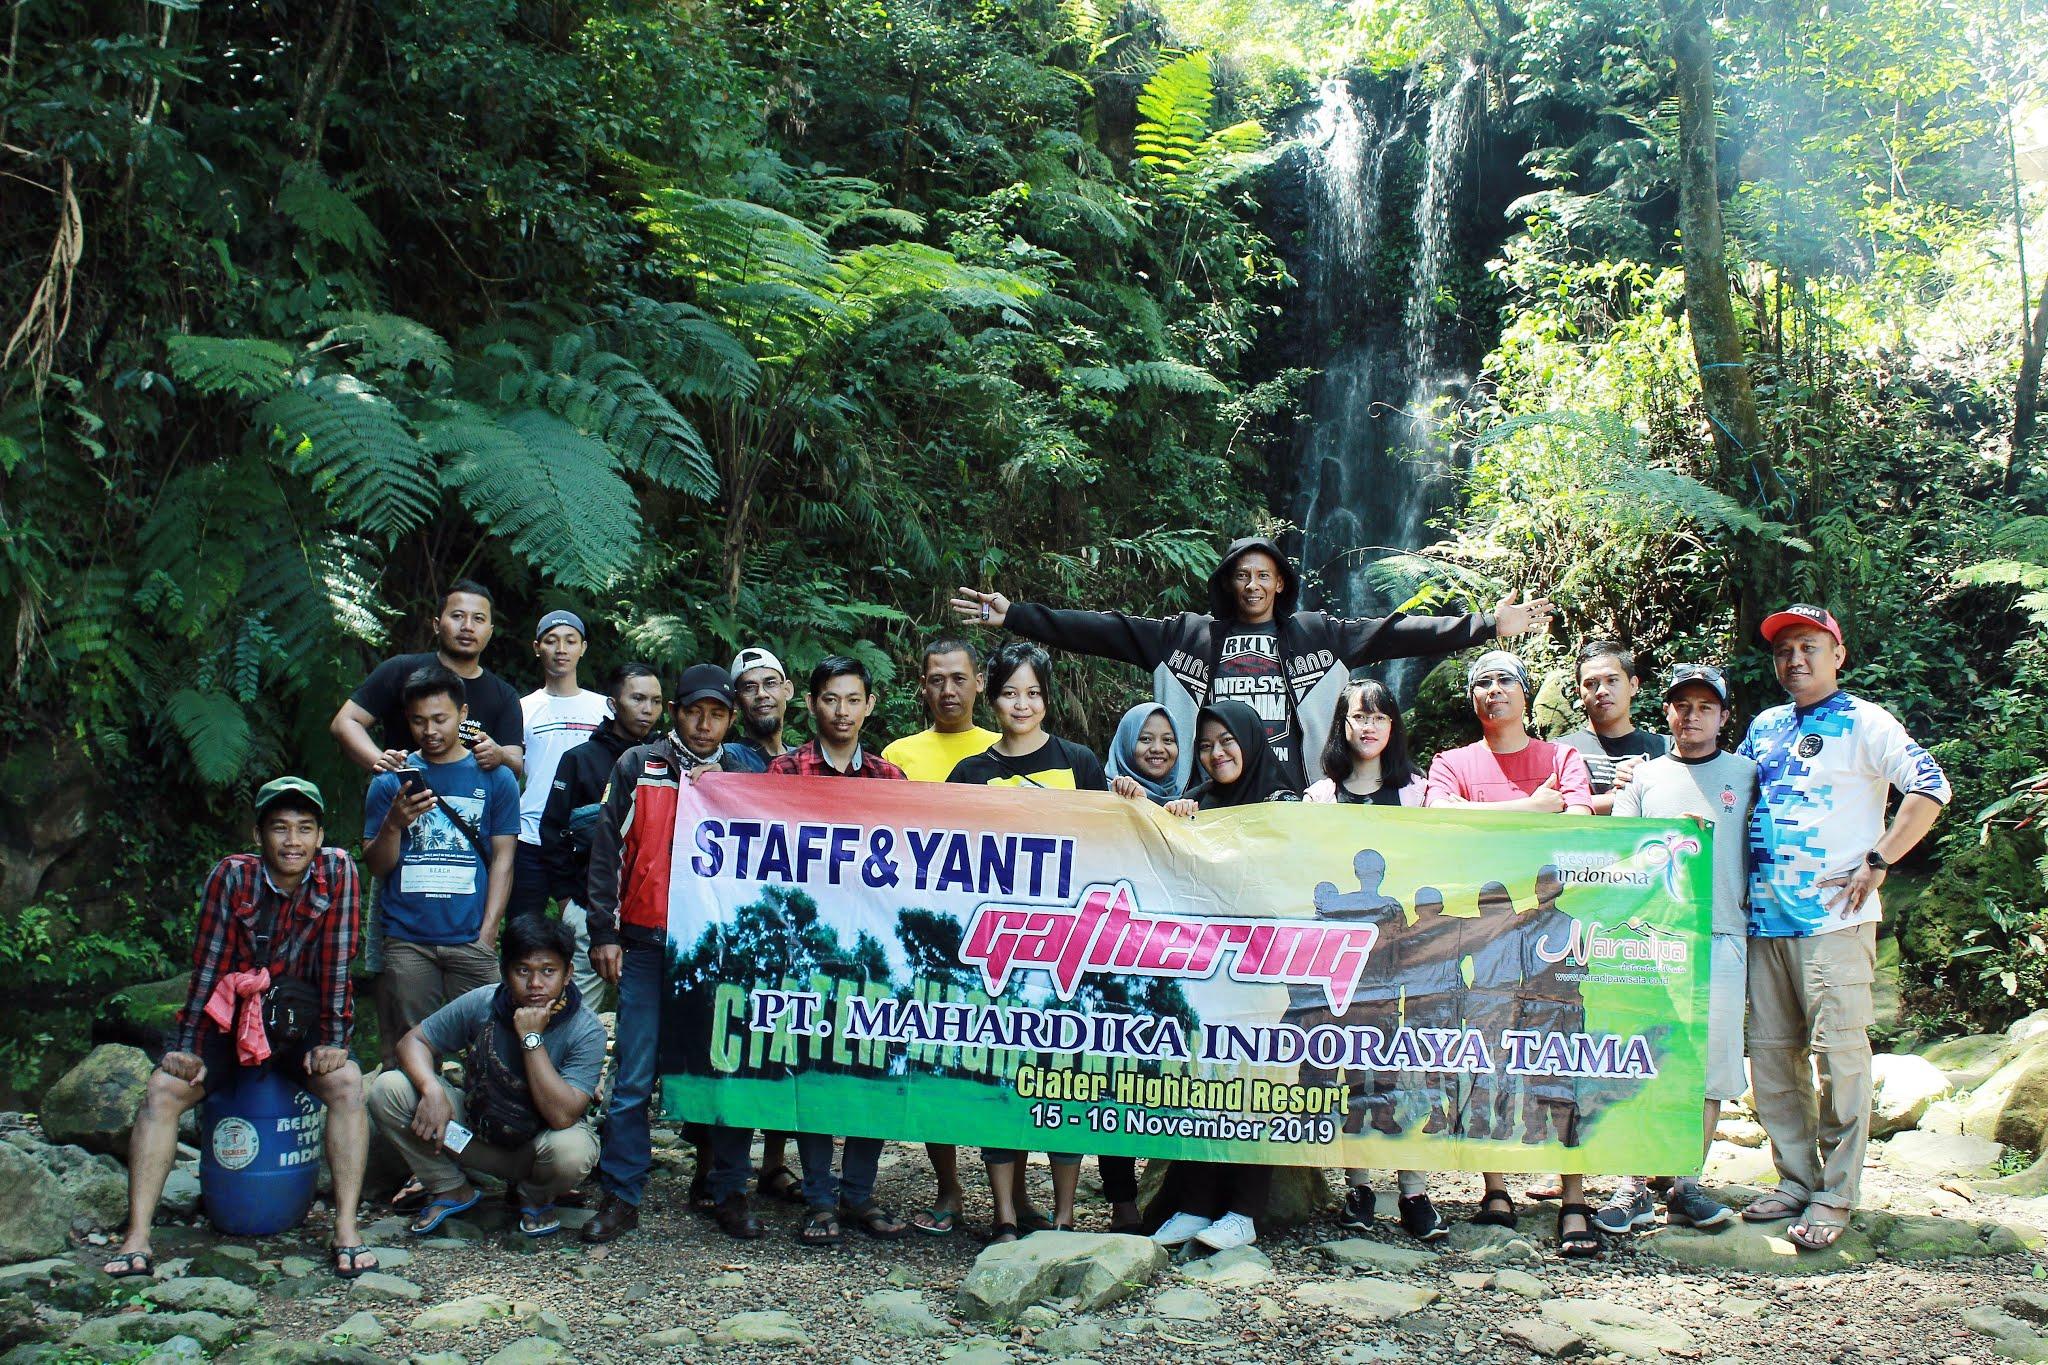 Wisata Alam Capolaga - Camping Outbound - Naradipa Wisata